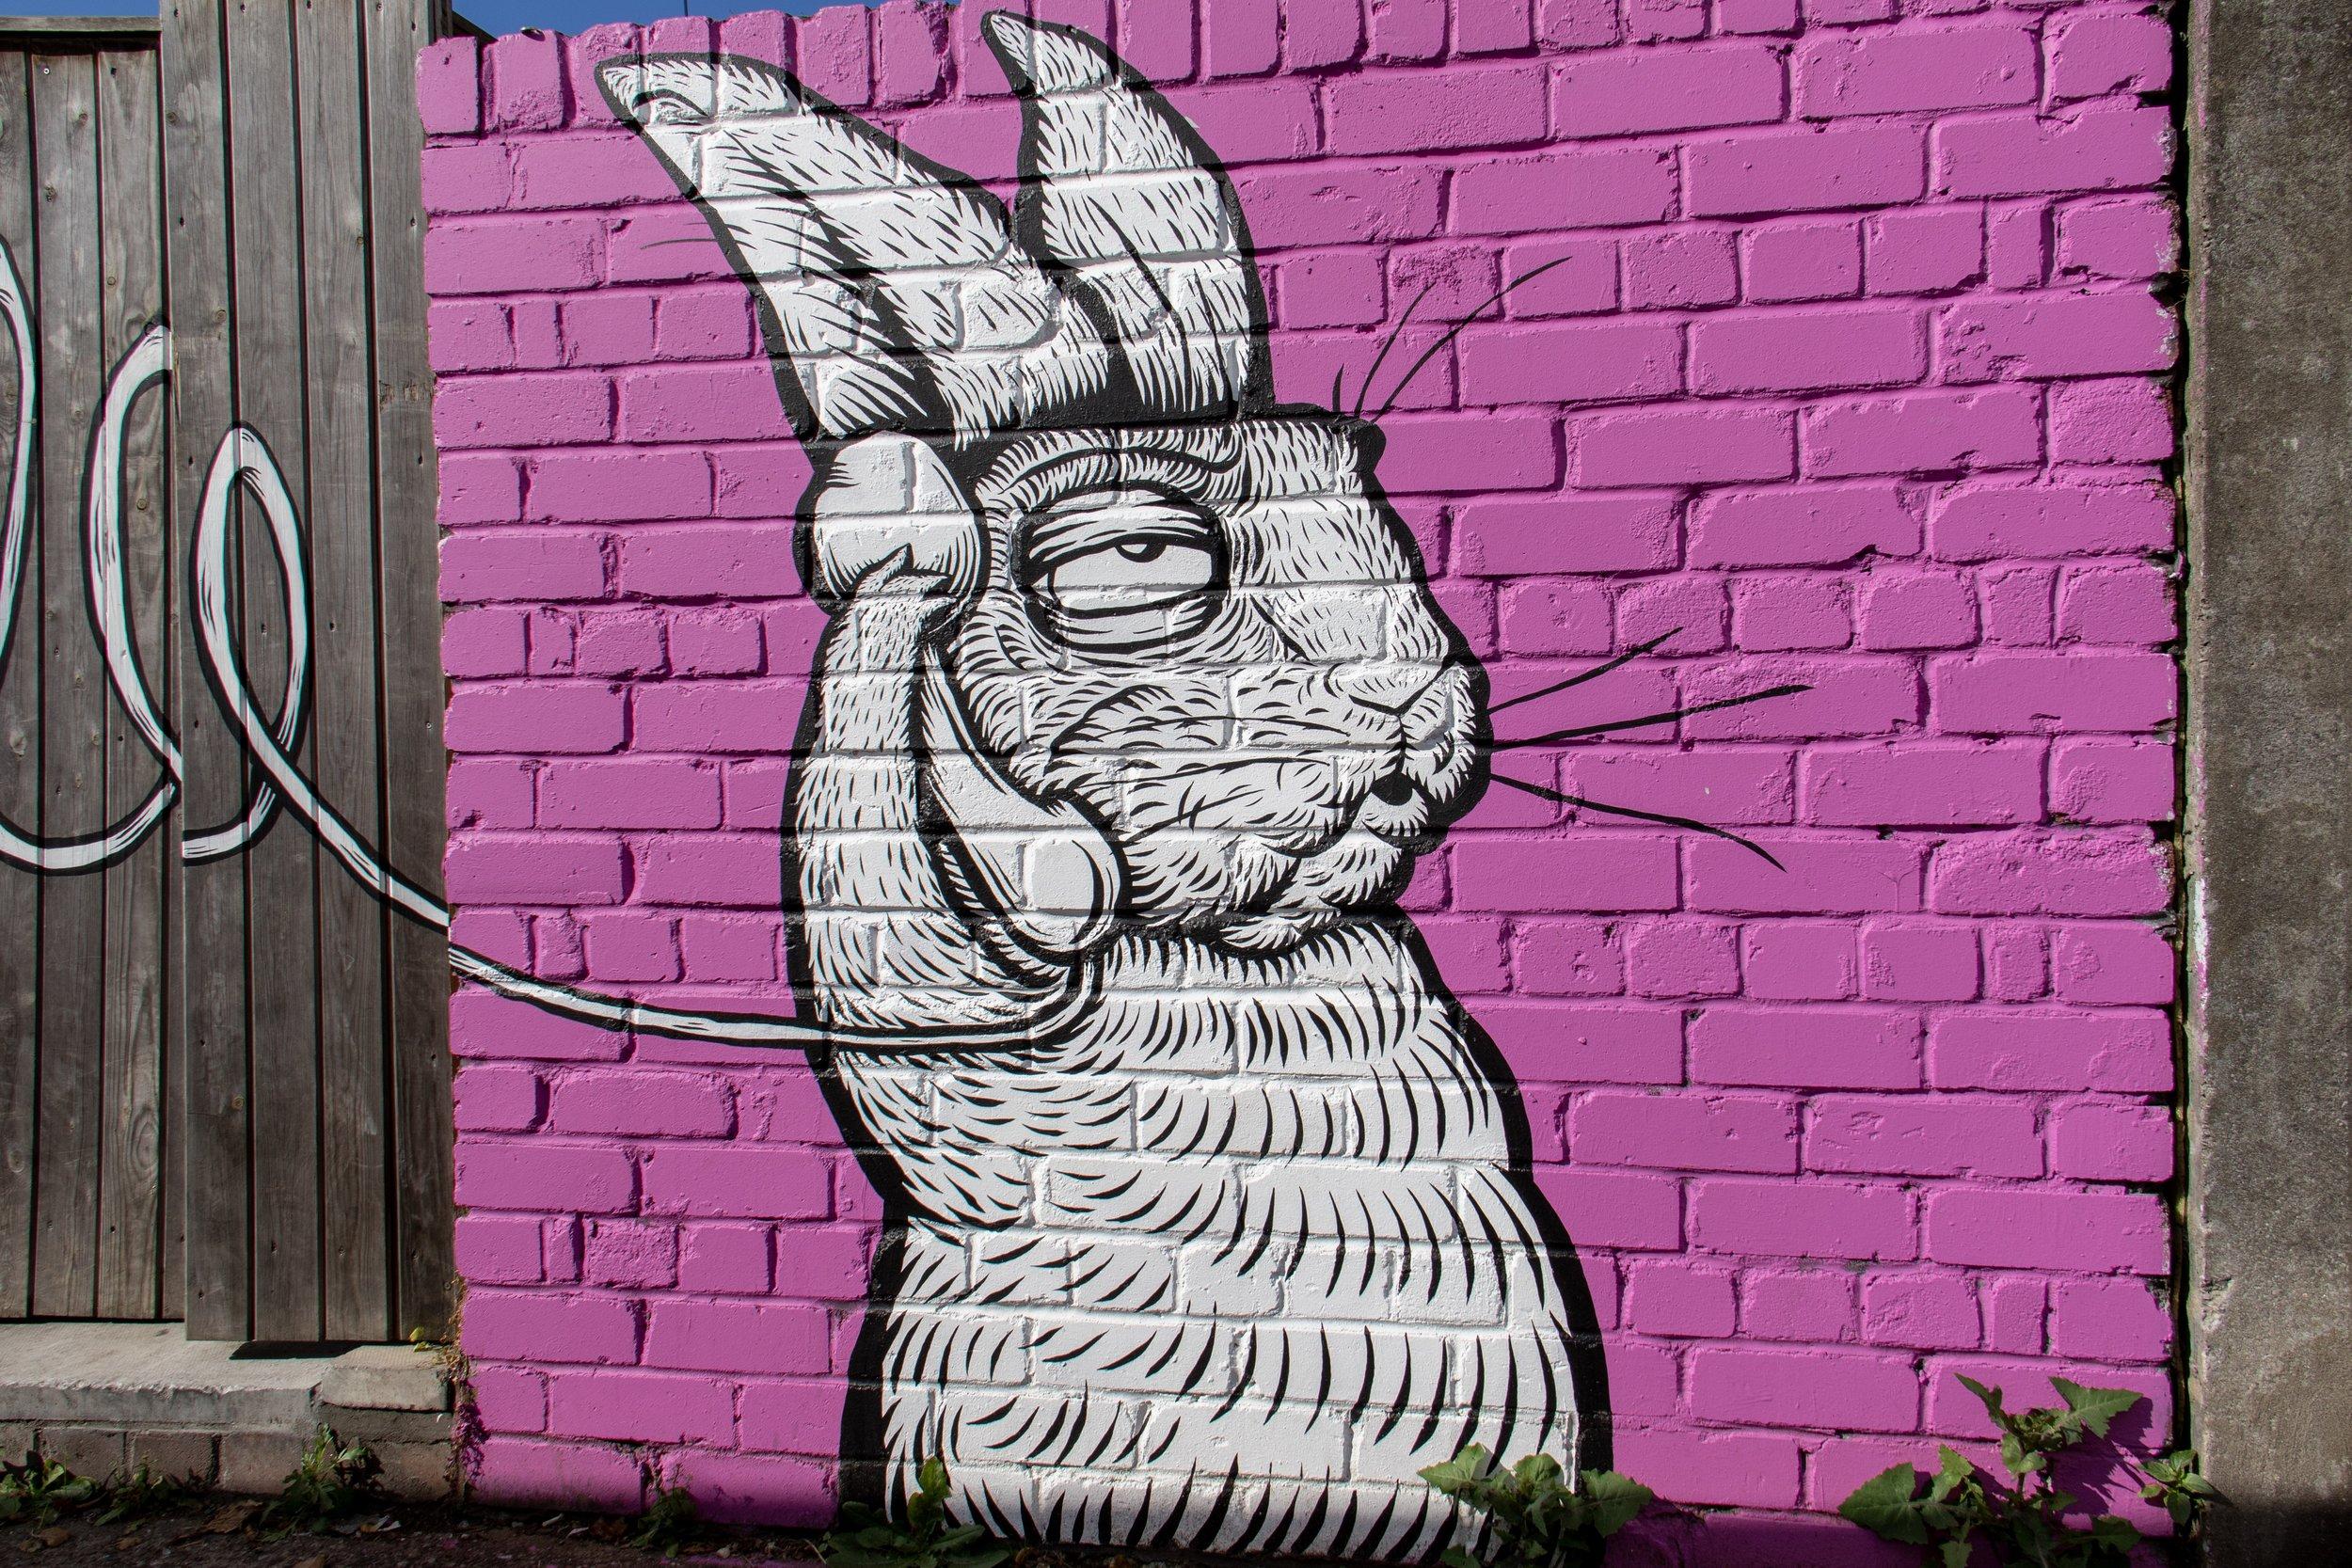 graffiti rabbit holding a telephone